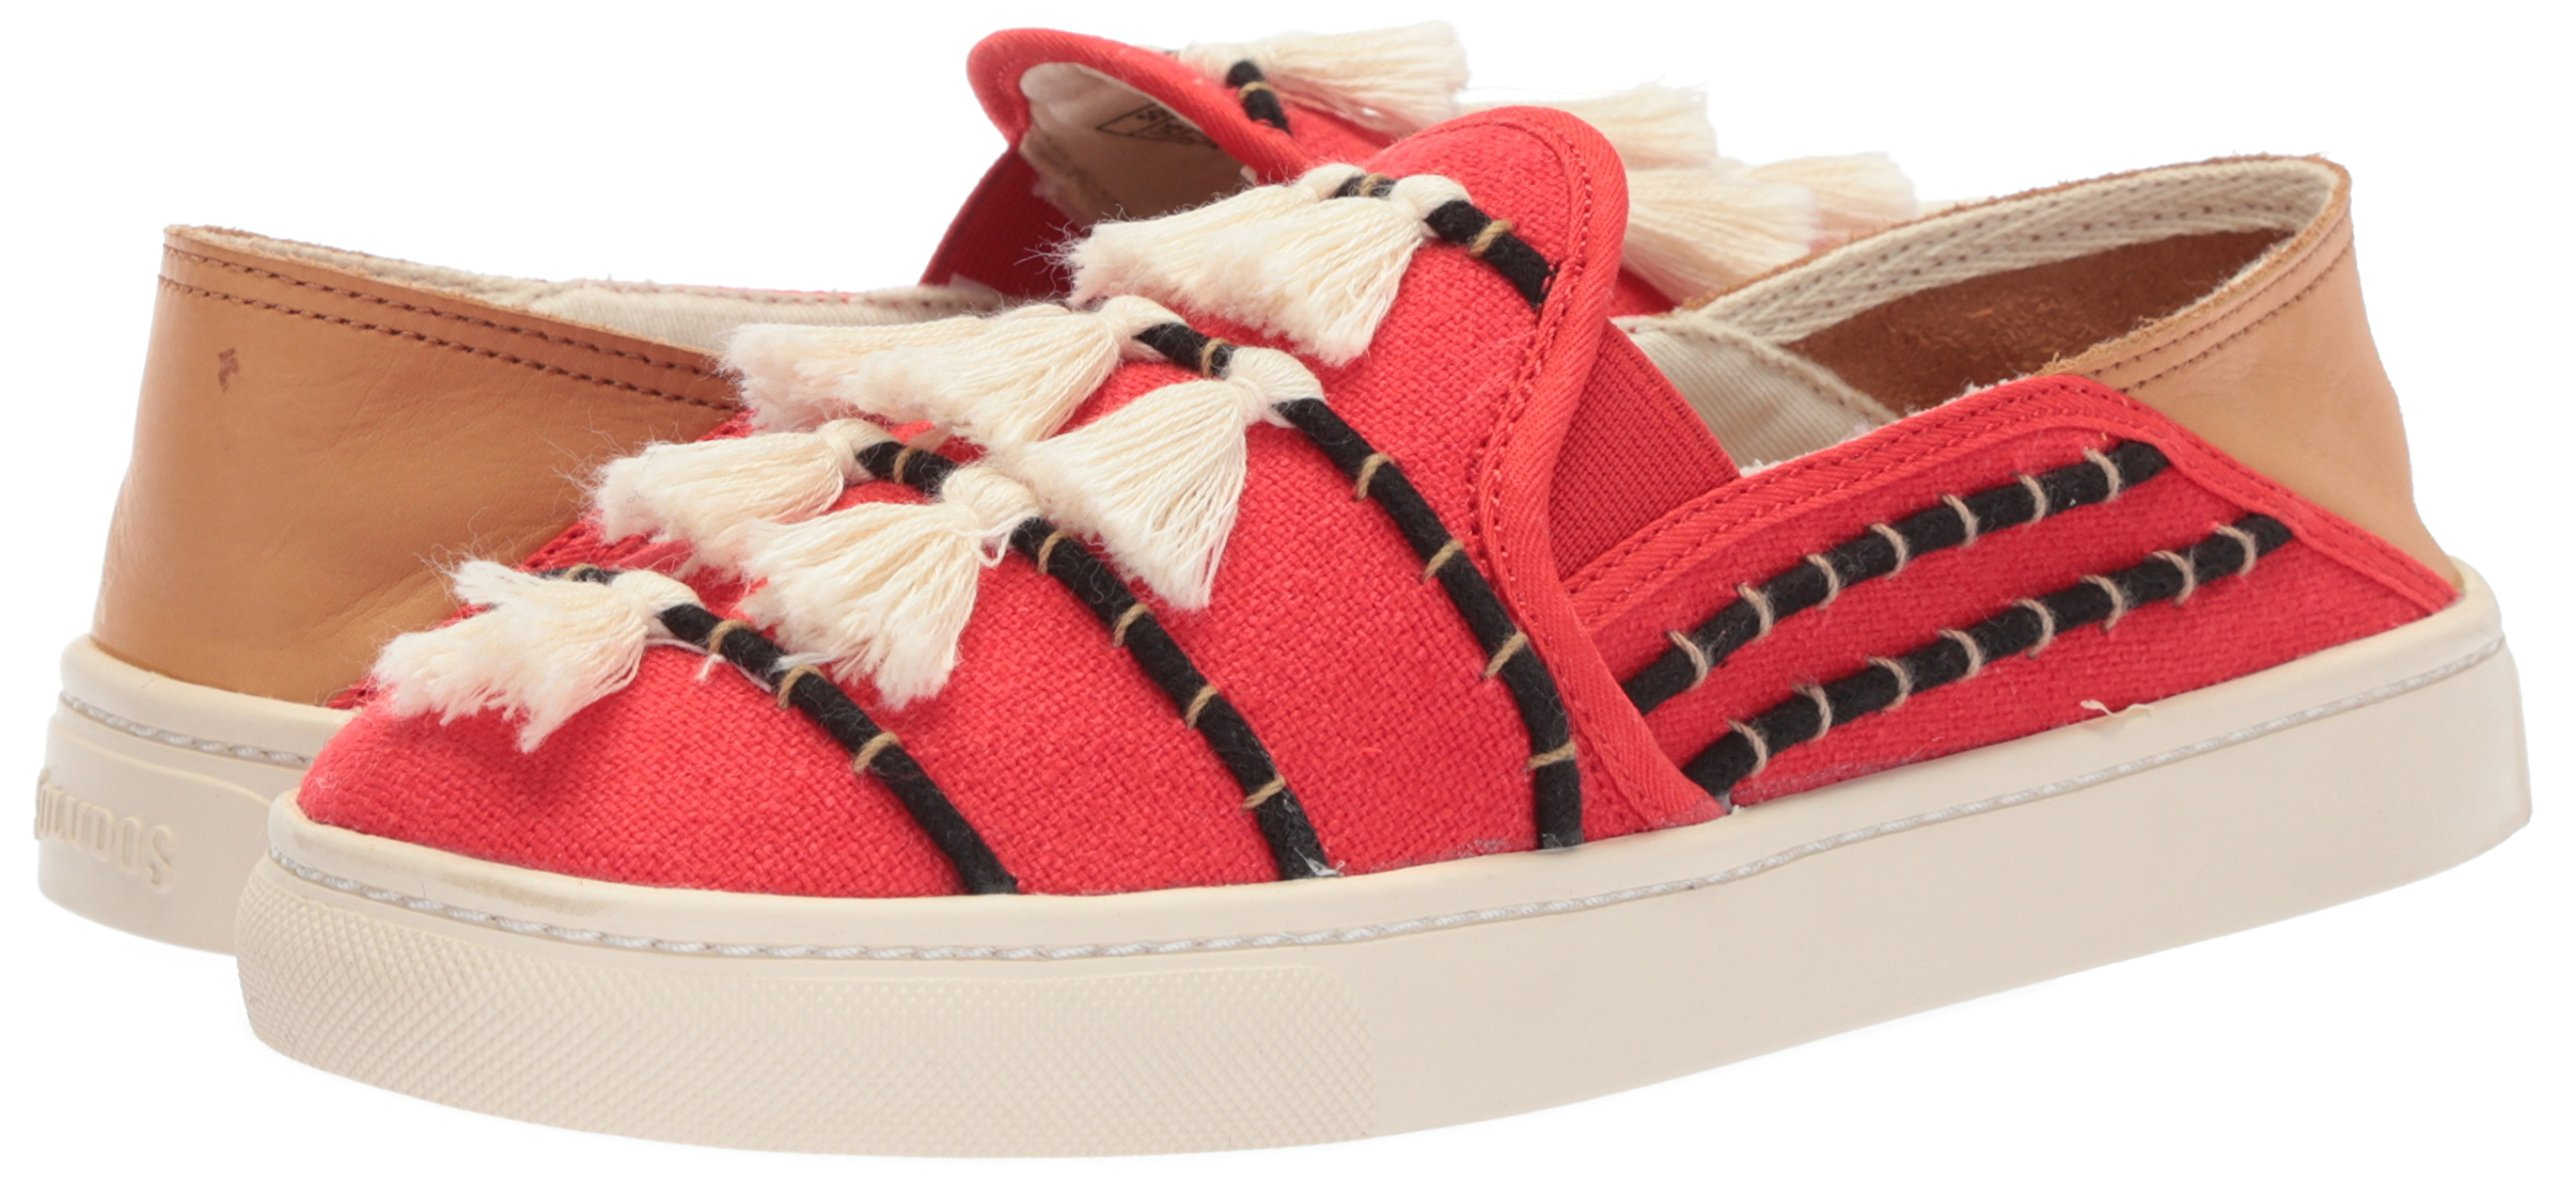 Soludos Women's Tassel Slip Sneaker, Red/Beige, 8 B US by Soludos (Image #6)